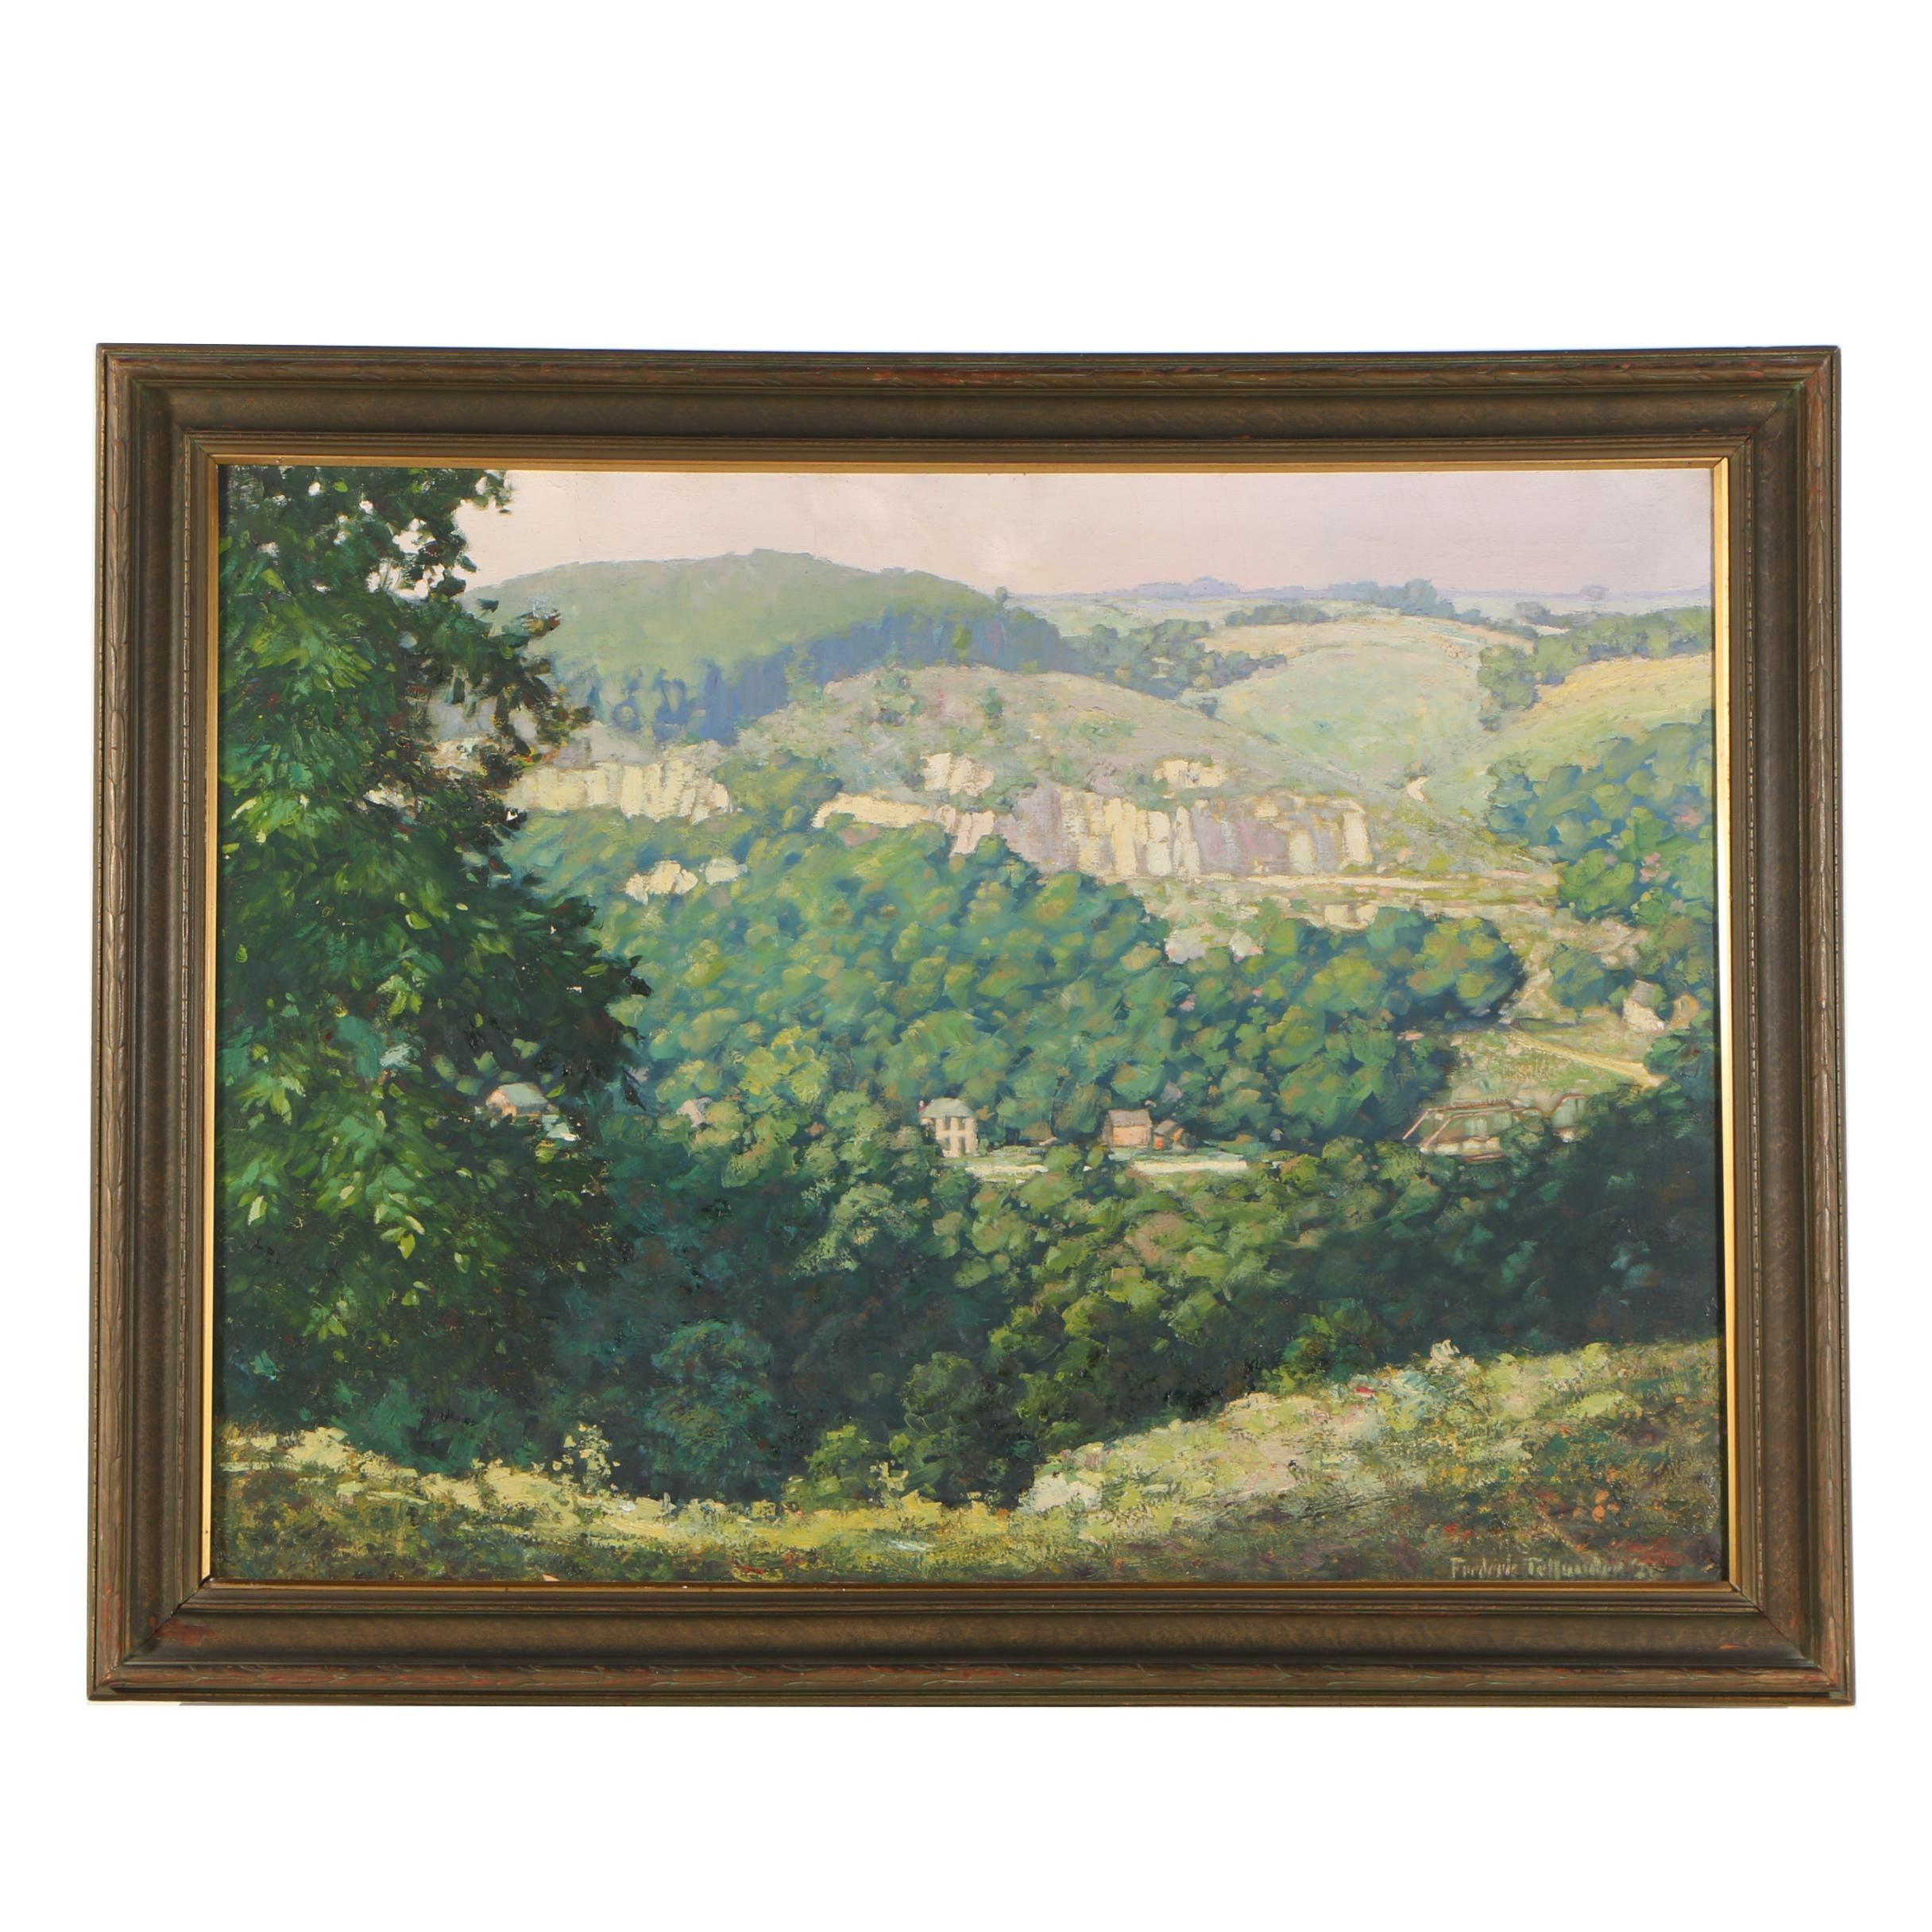 Frederic Tellander Landscape Oil Painting